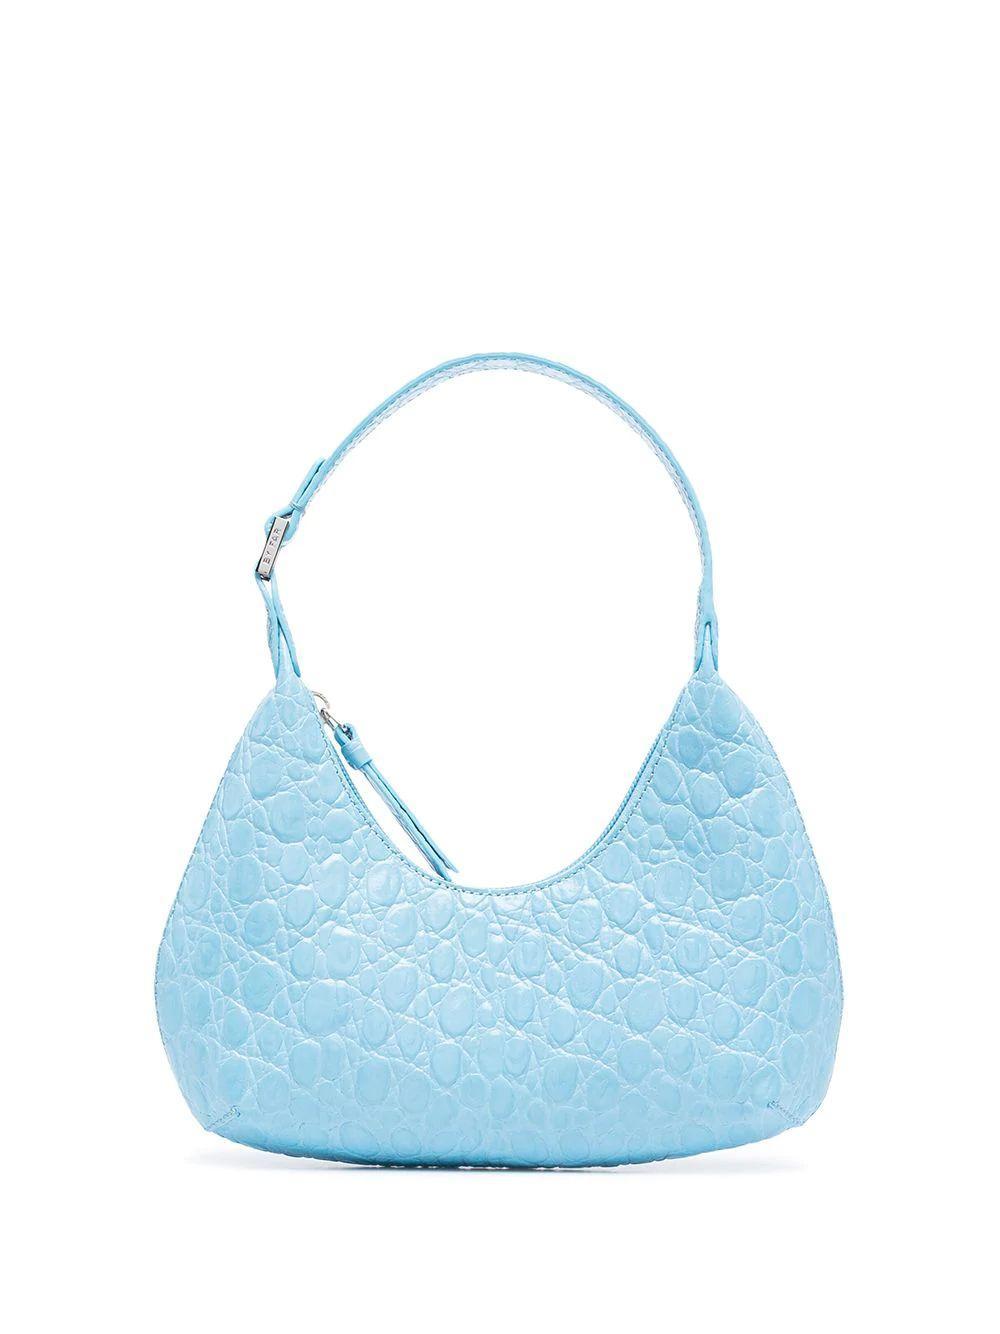 Baby Amber Croco Bag Item # 21CRBASLGNDSMA